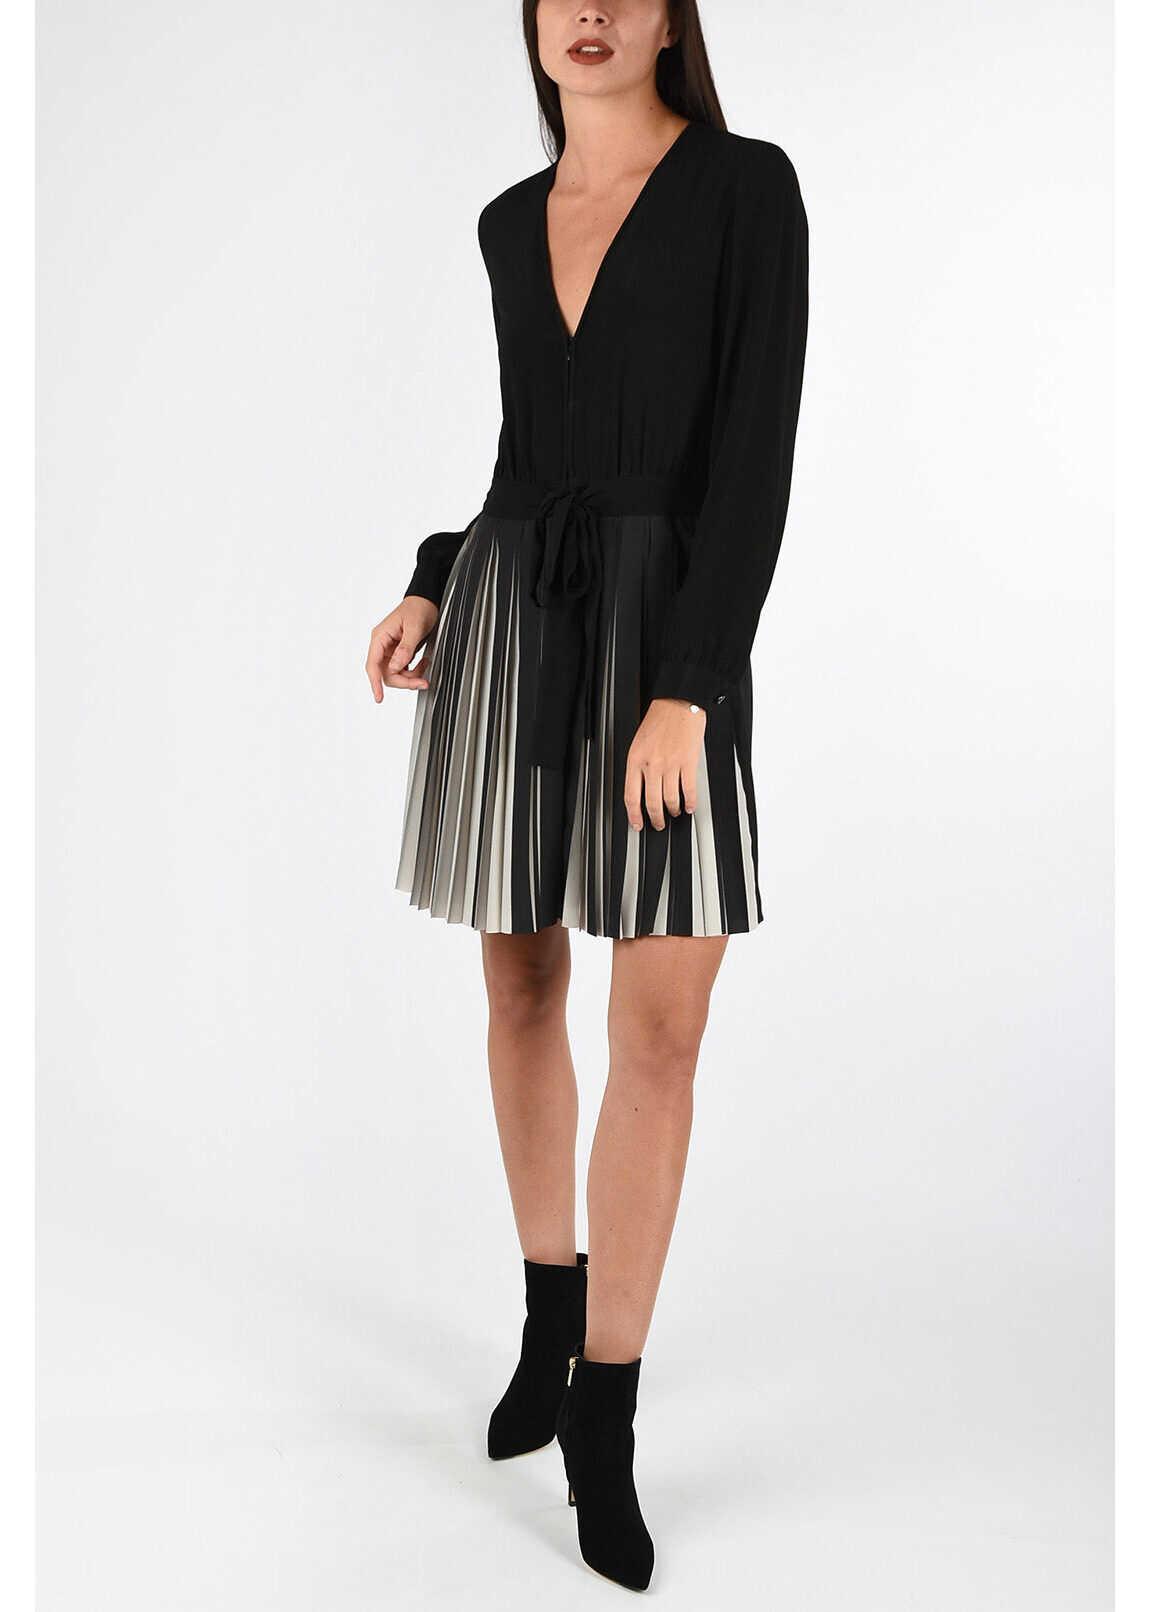 Armani EMPORIO Pleated Dress BLACK